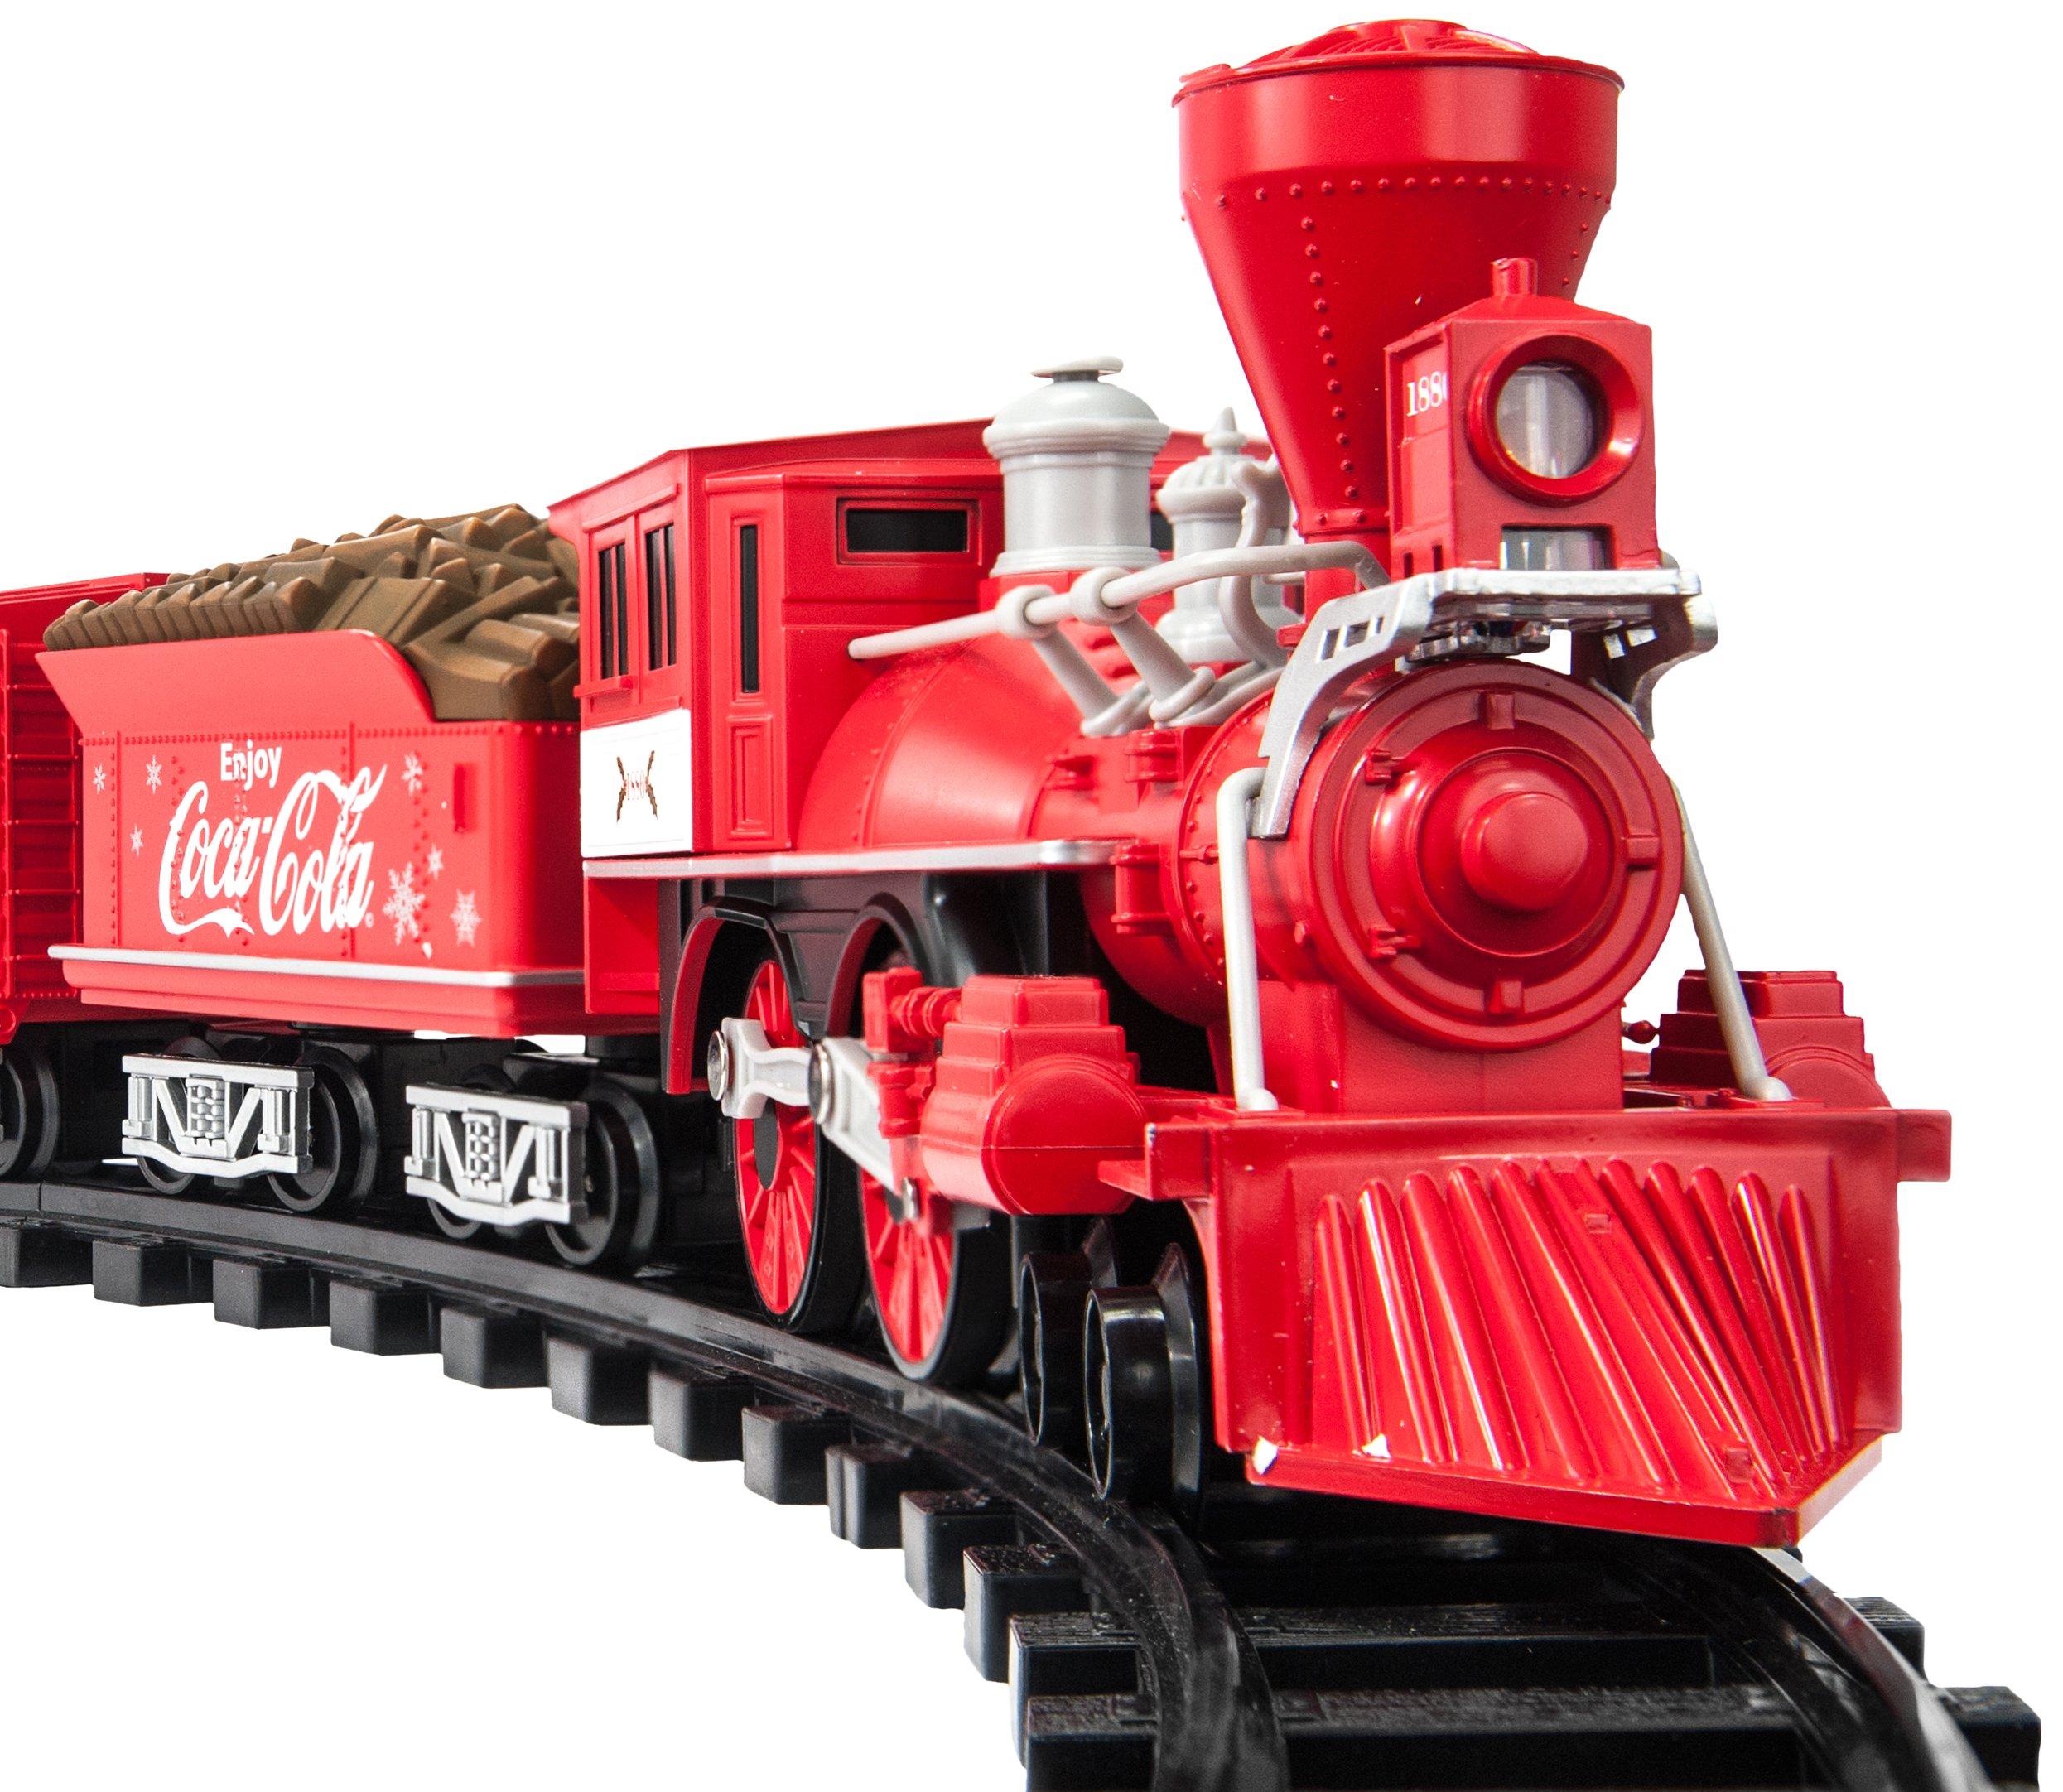 Lionel Trains Coca-Cola Holiday G-Gauge Train Set 16